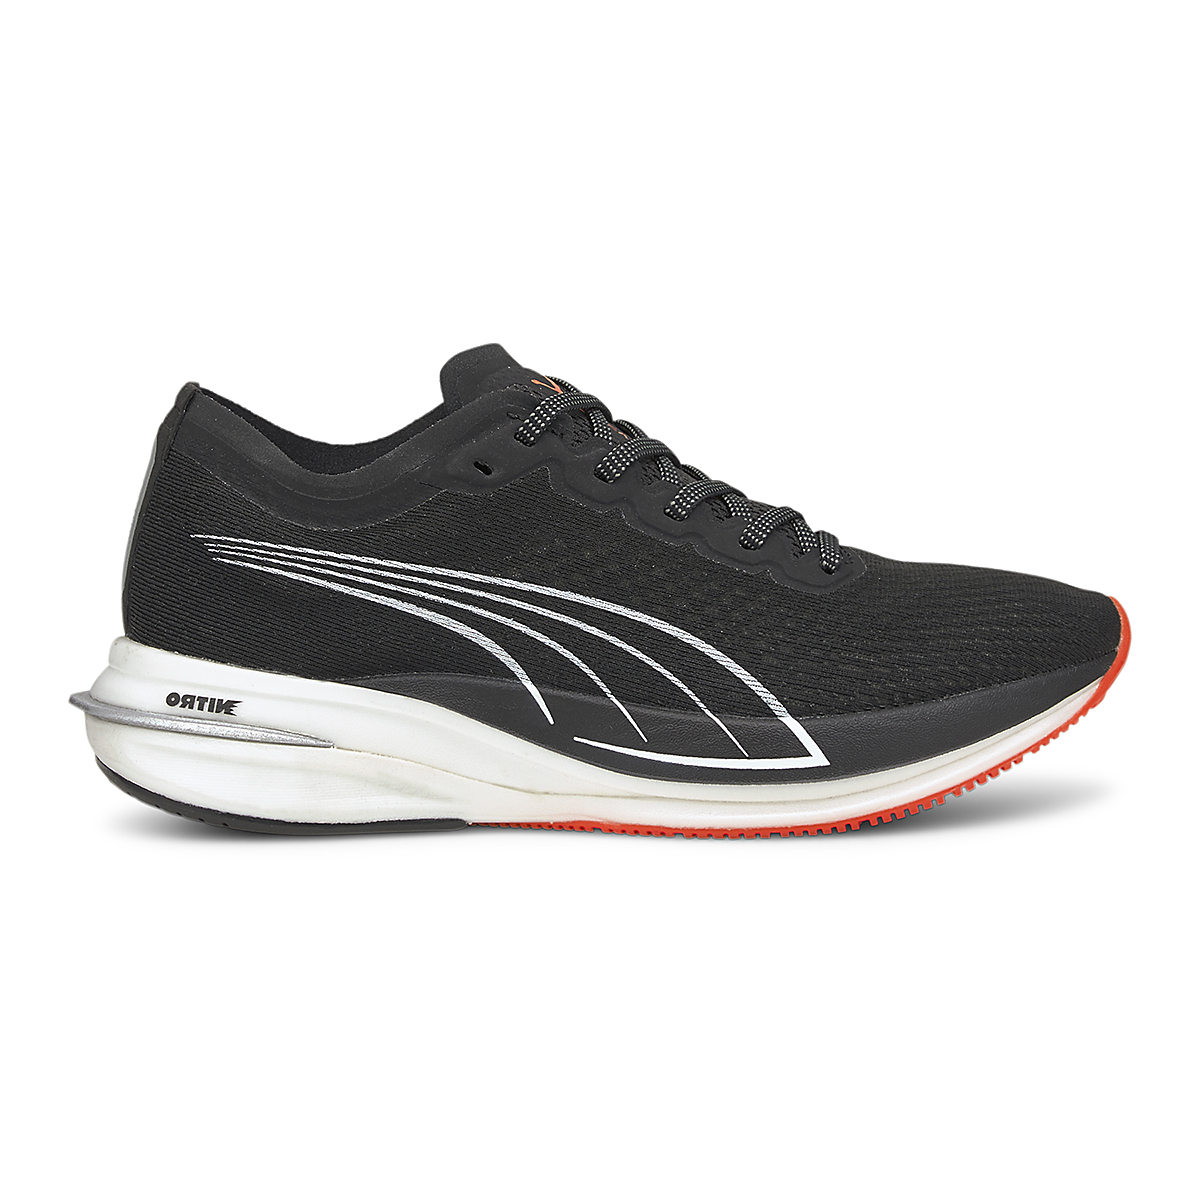 Women's Puma Deviate Nitro Running Shoe - Color: Puma Black-Lava Blast - Size: 5.5 - Width: Regular, Puma Black-Lava Blast, large, image 1